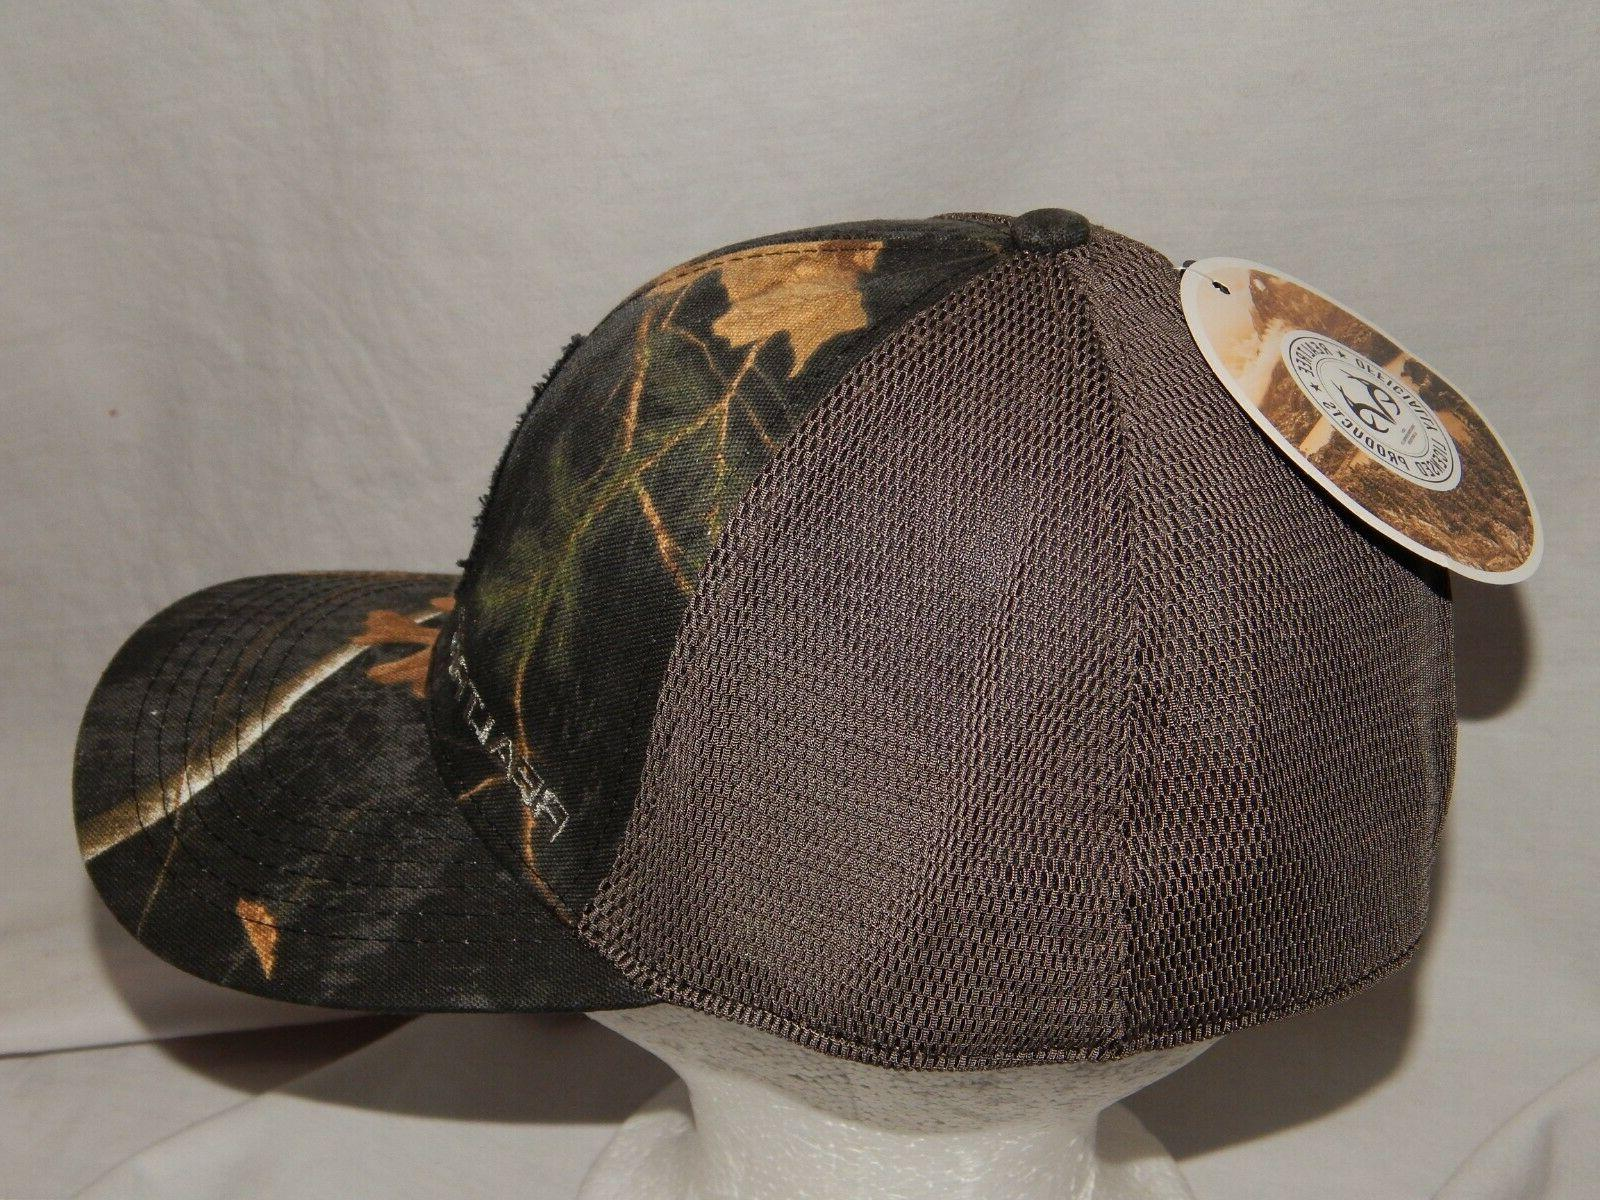 NEW Cap Camouflage Stretch Fit Camo Mens S/M L/XL